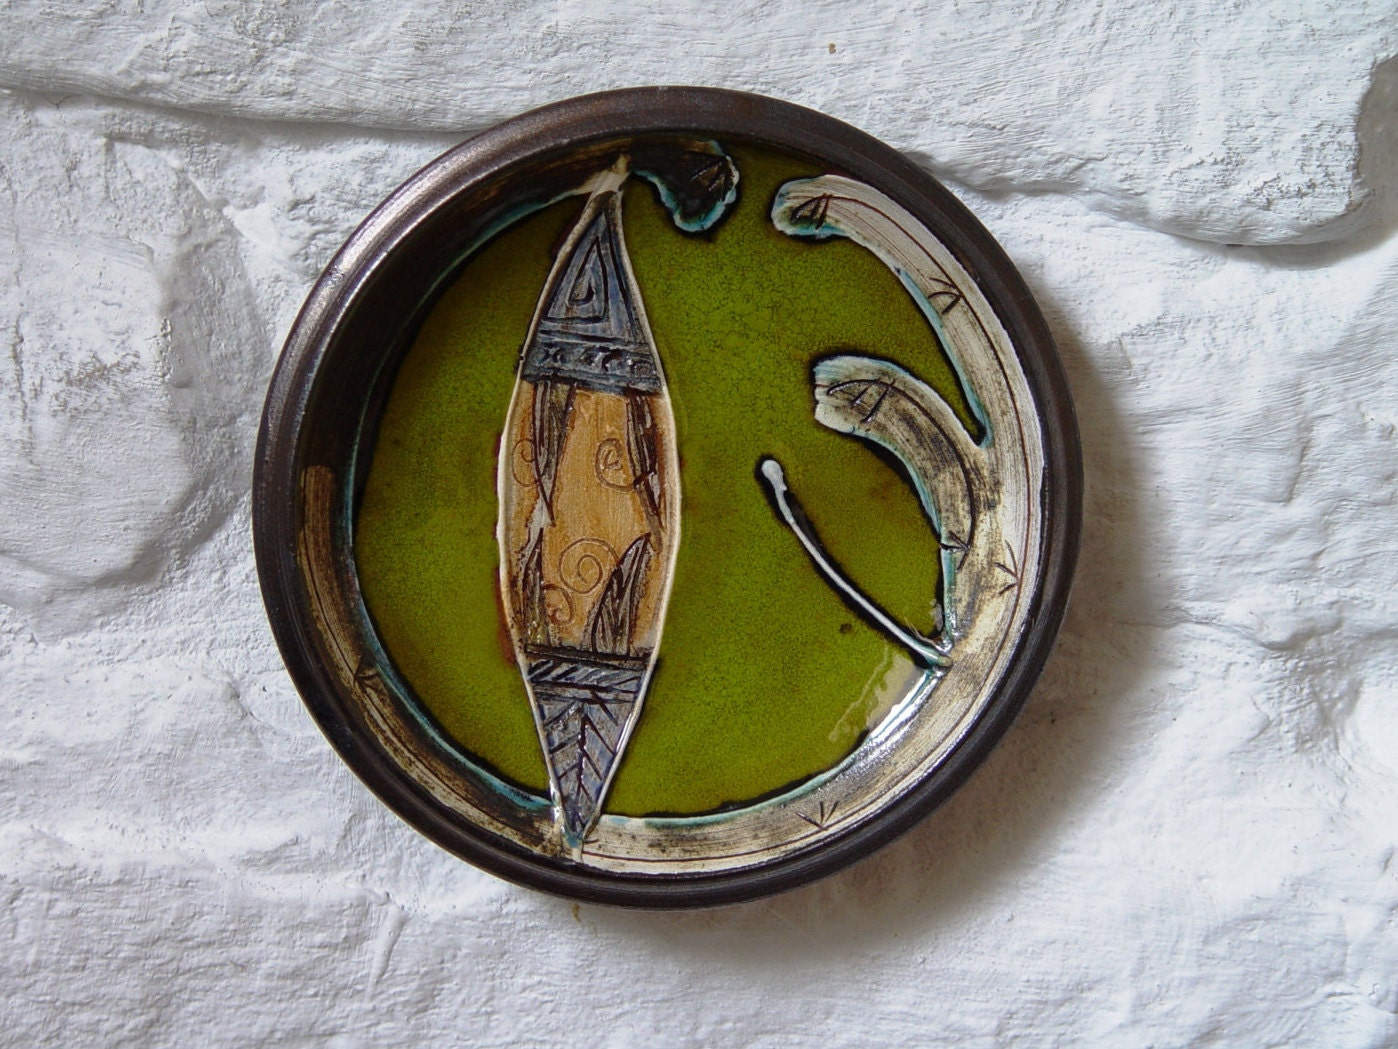 Wall Hanging Green Ceramic Plate Kitchen Decor Small Earthen Mantle Piece Handmade Pottery Danko